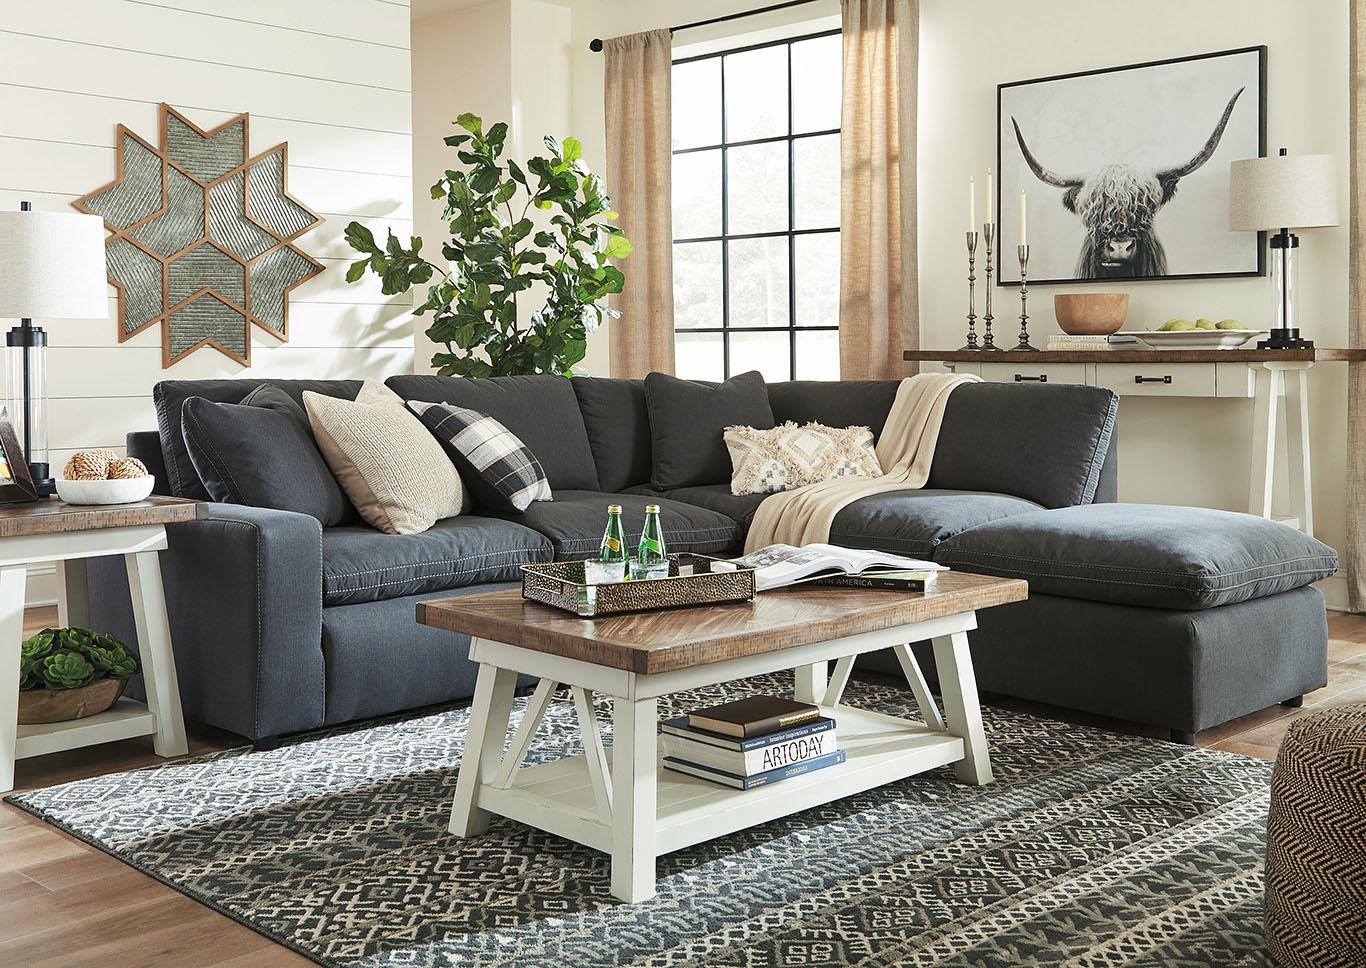 Savesto Corner Chair Sectional